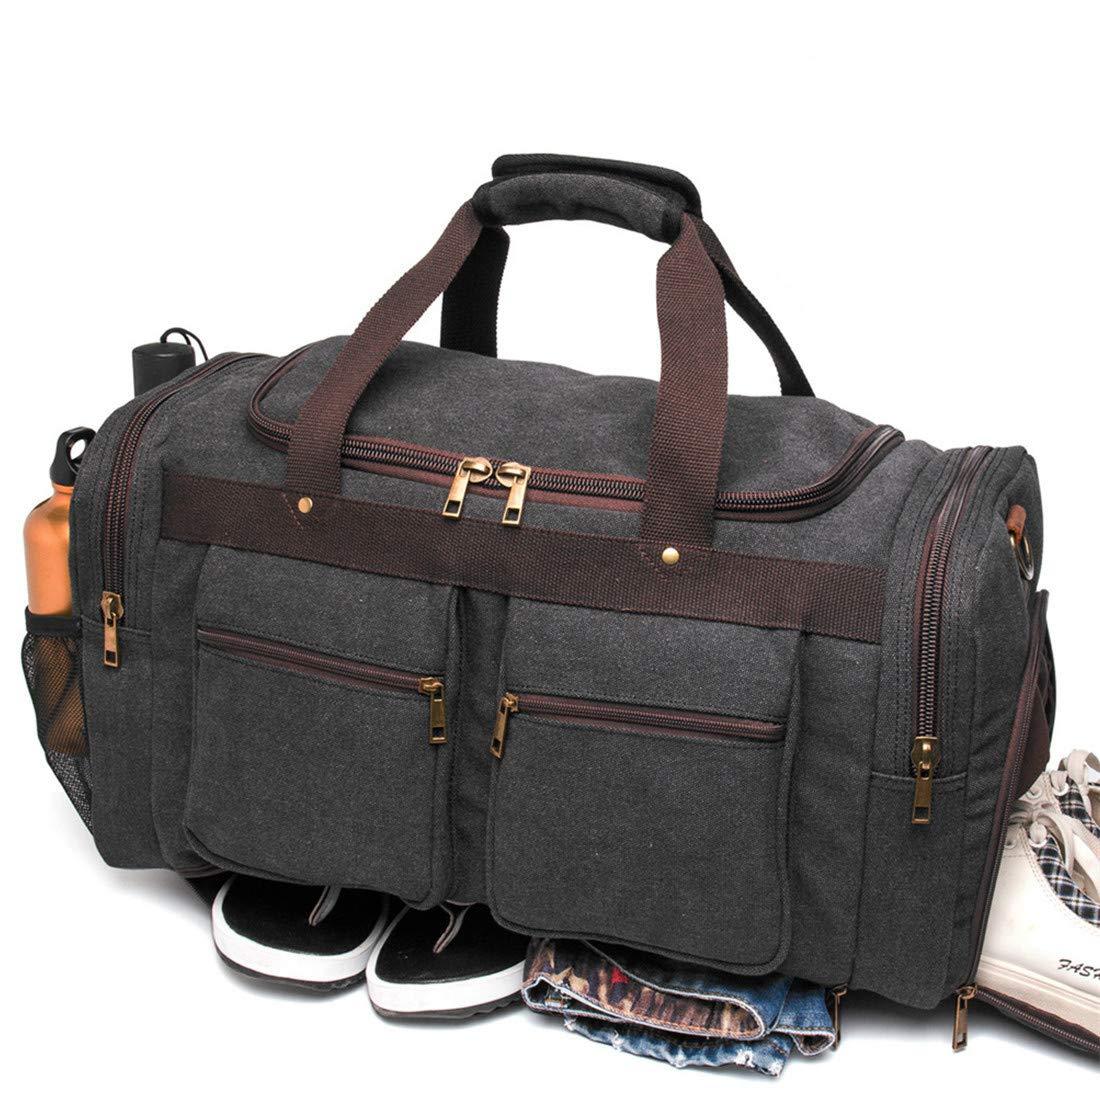 Amazon.com: Weekender Overnight Bolsa de viaje para zapatos ...